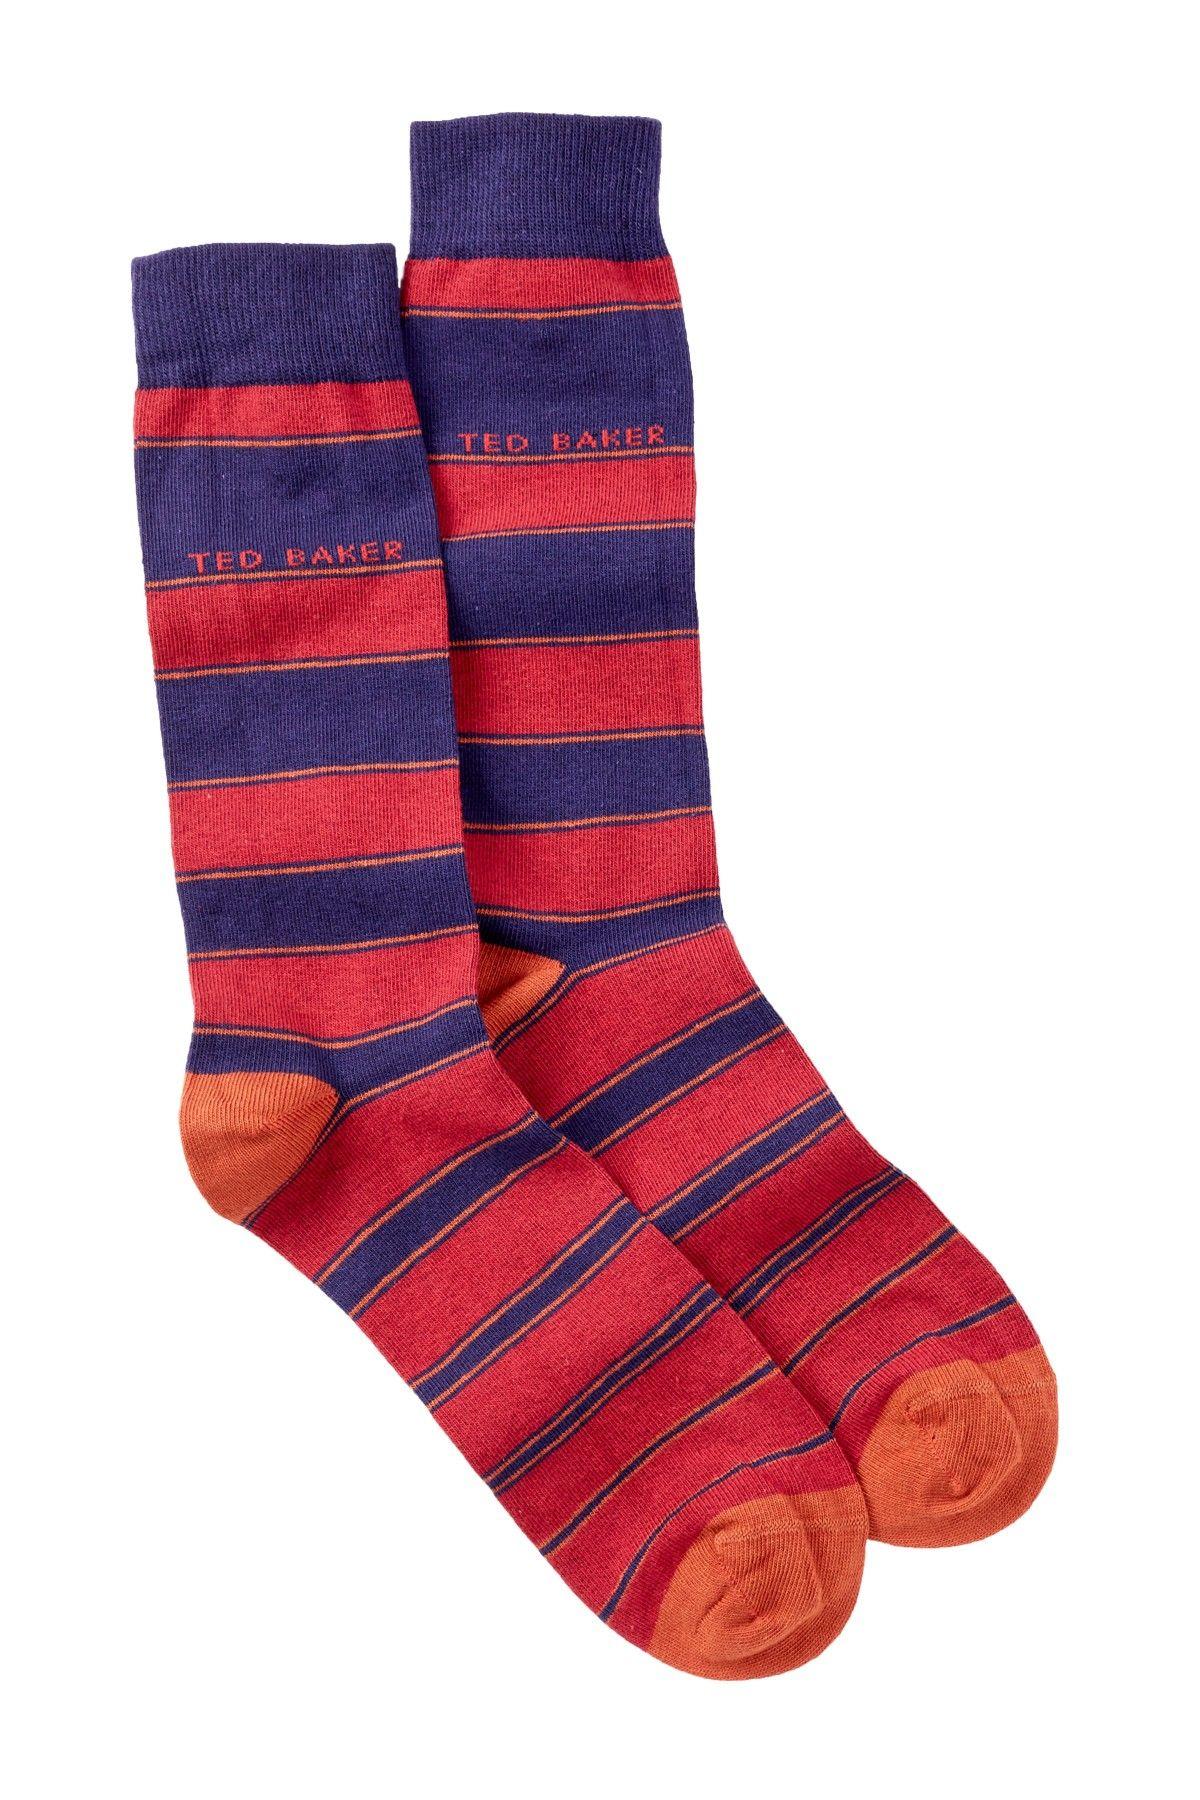 Ted Baker London   Korowiz Graduated Stripe Socks   Free shipping ...